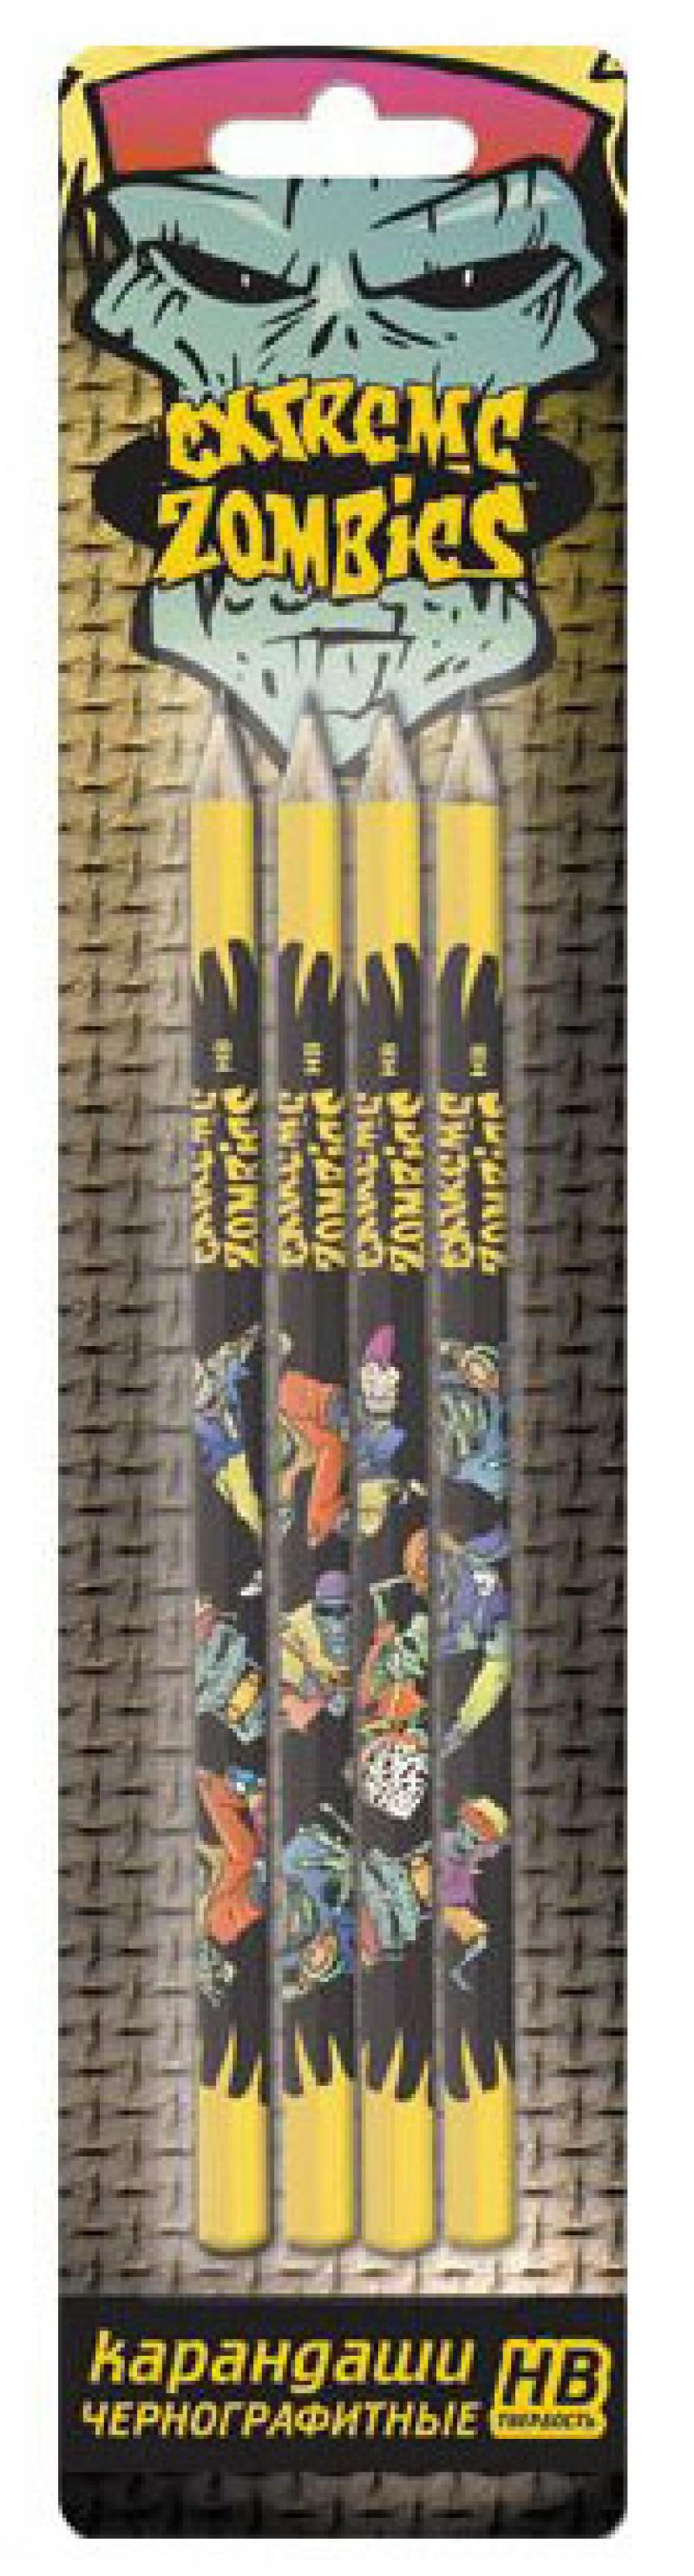 Картинка для Карандаши чернографитные Action! Extreme Zombie 4 шт EZ-ALP185/4 с печатью на корпусе EZ-ALP185/4